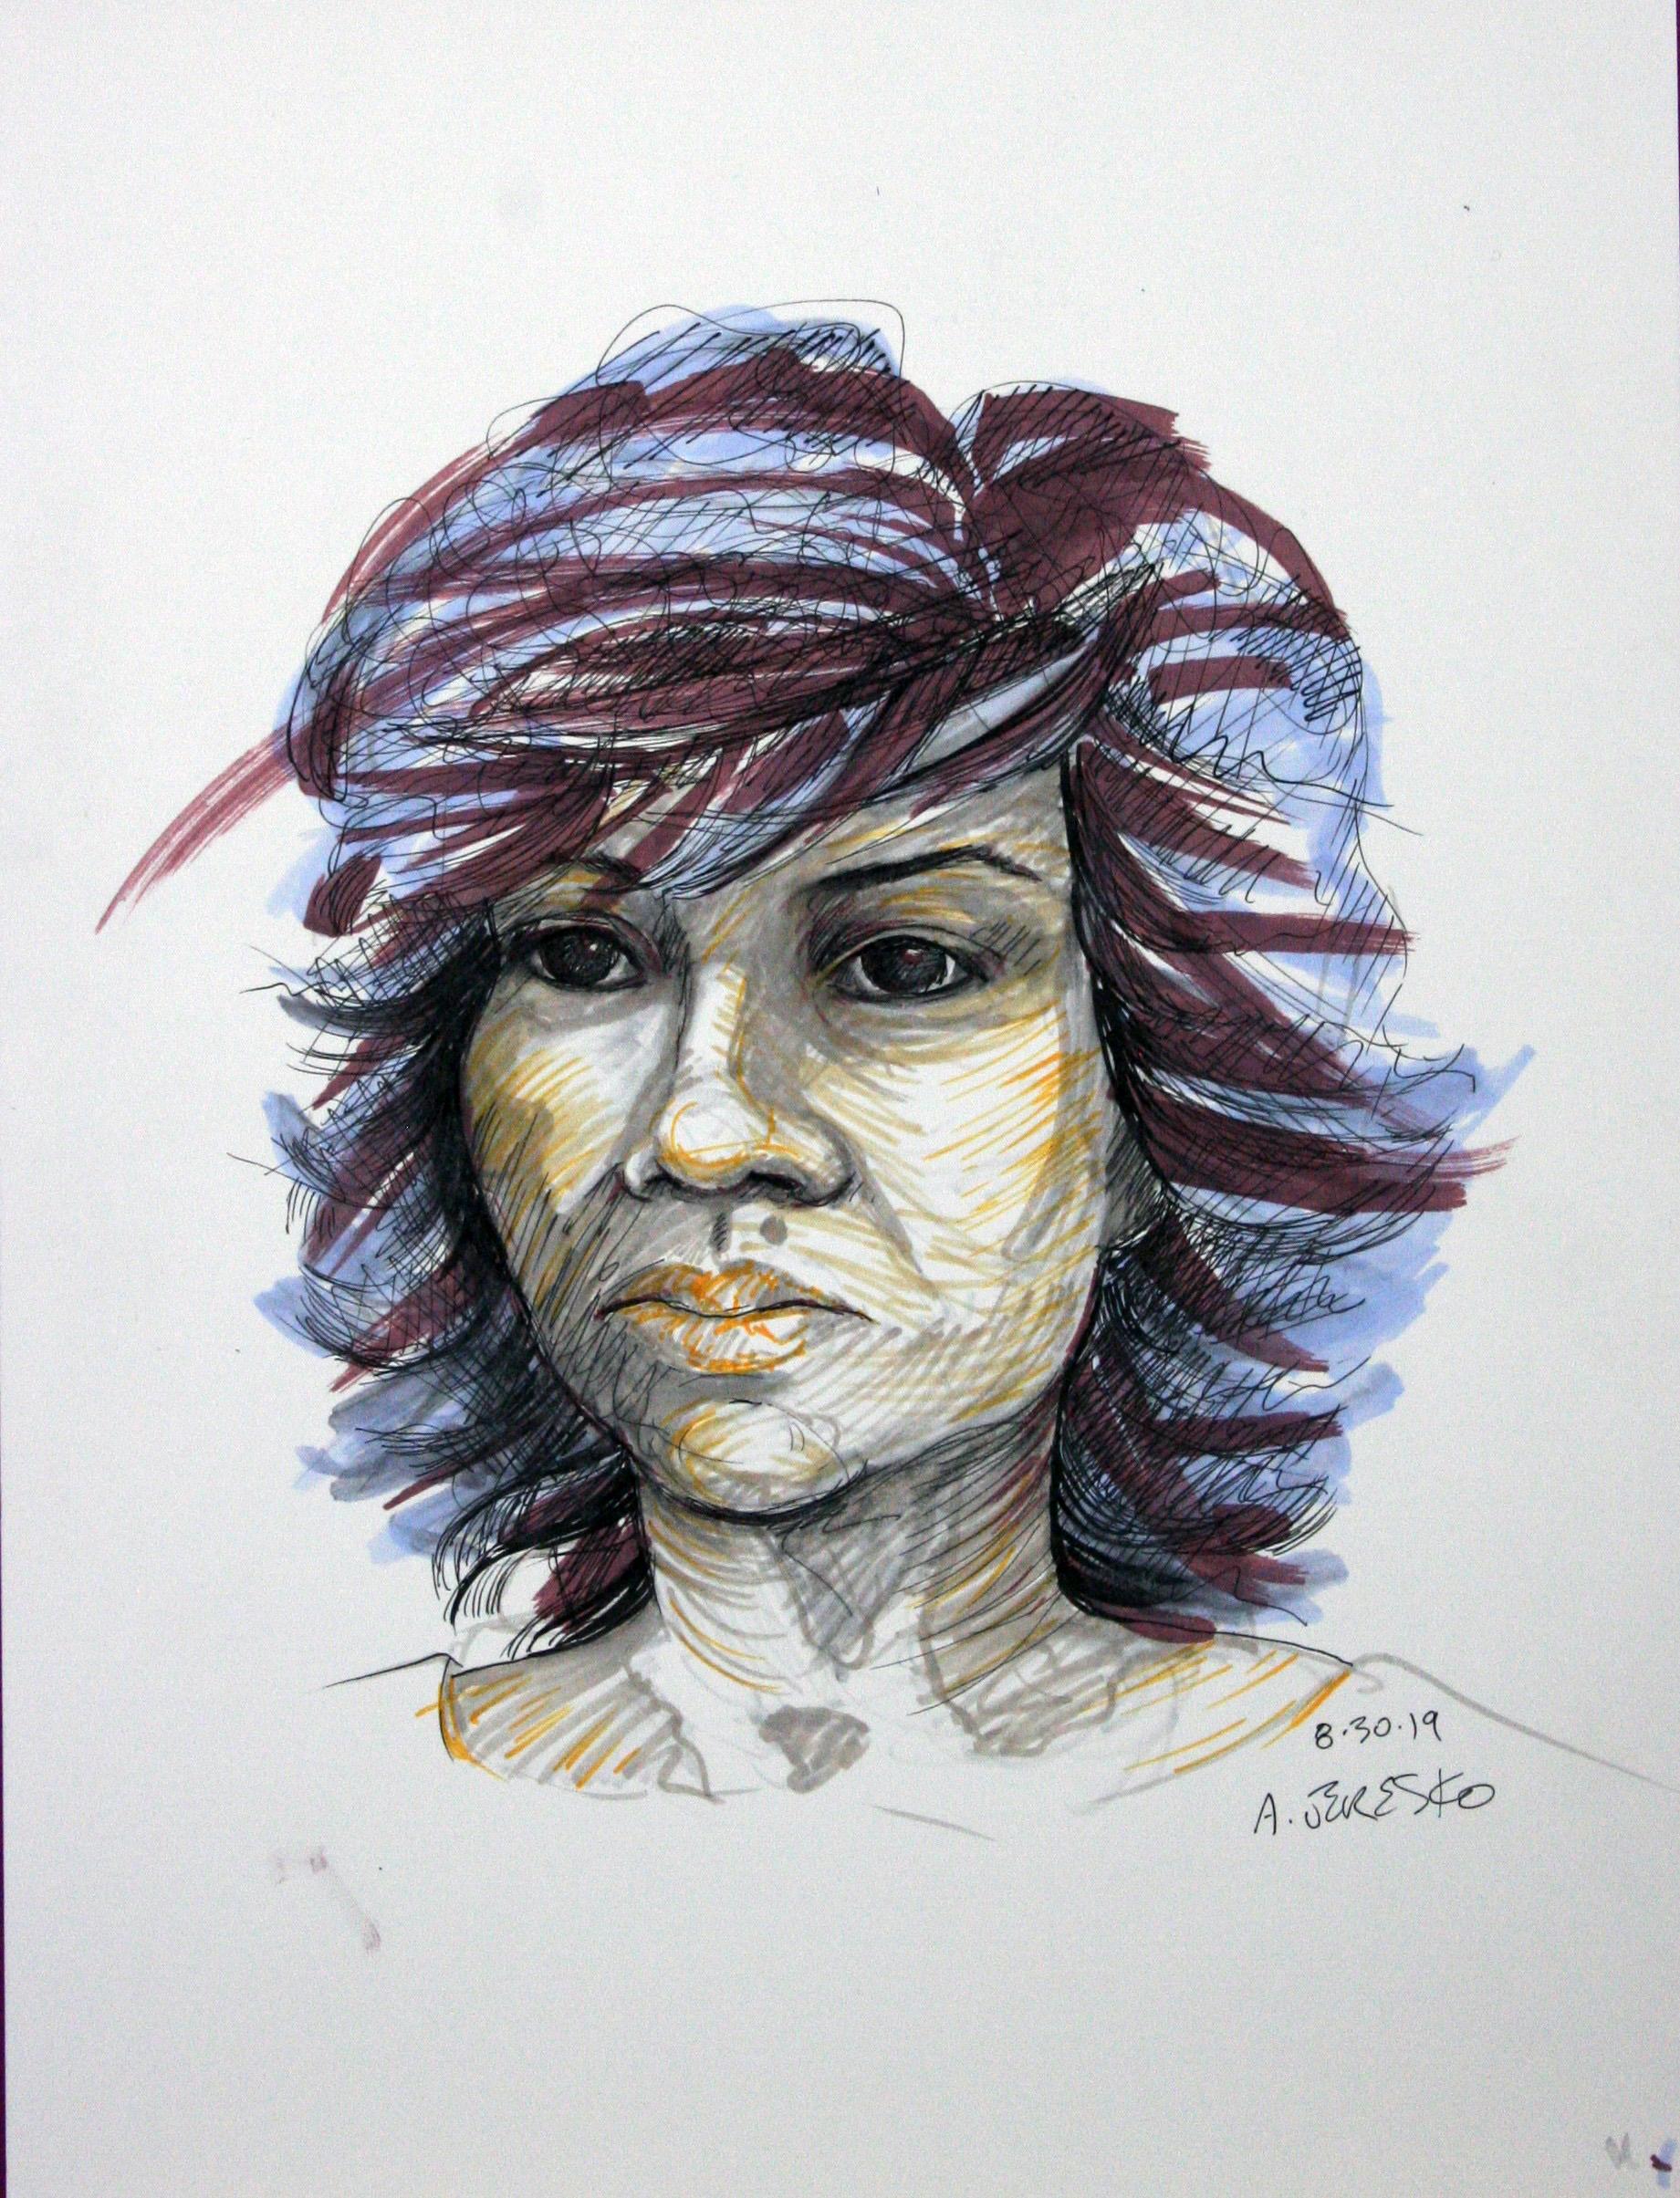 Alice M. Jeresko - Mixed media